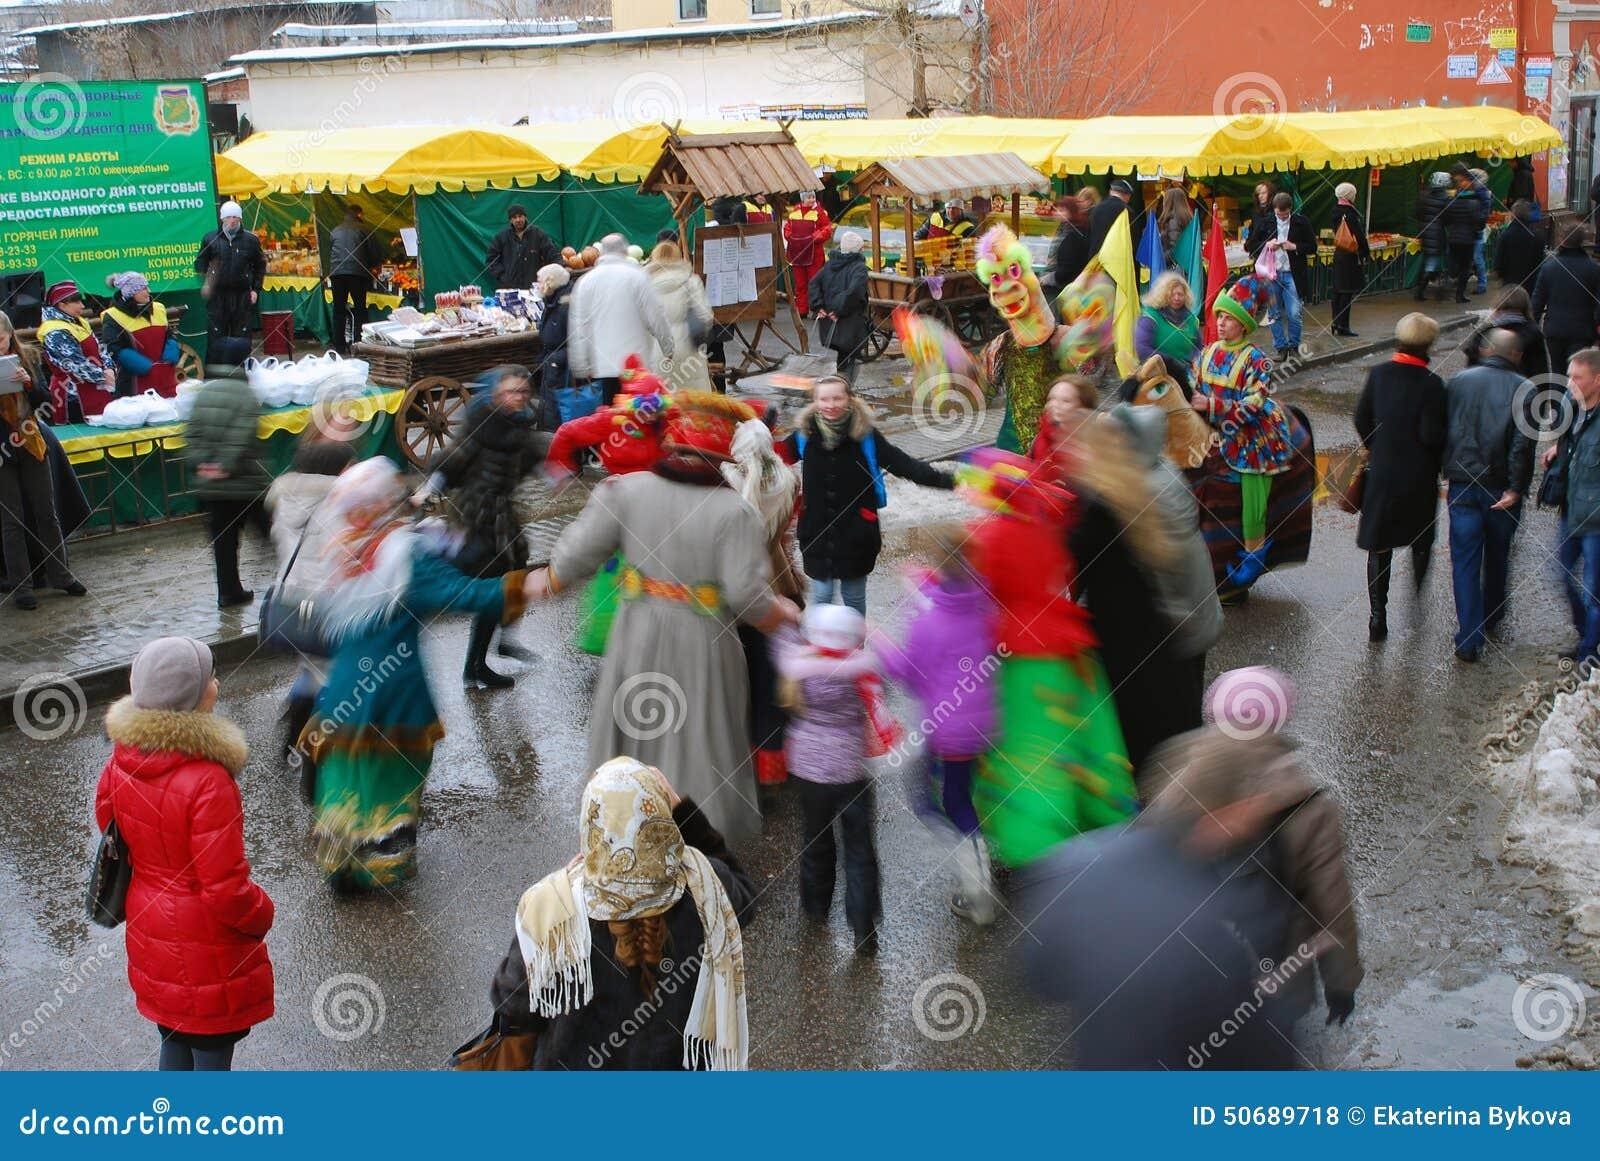 Download 街道演员和普通人在街道上跳舞 编辑类库存照片. 图片 包括有 庆祝, ,并且, 实际, 小丑, 狂欢节, 背包 - 50689718